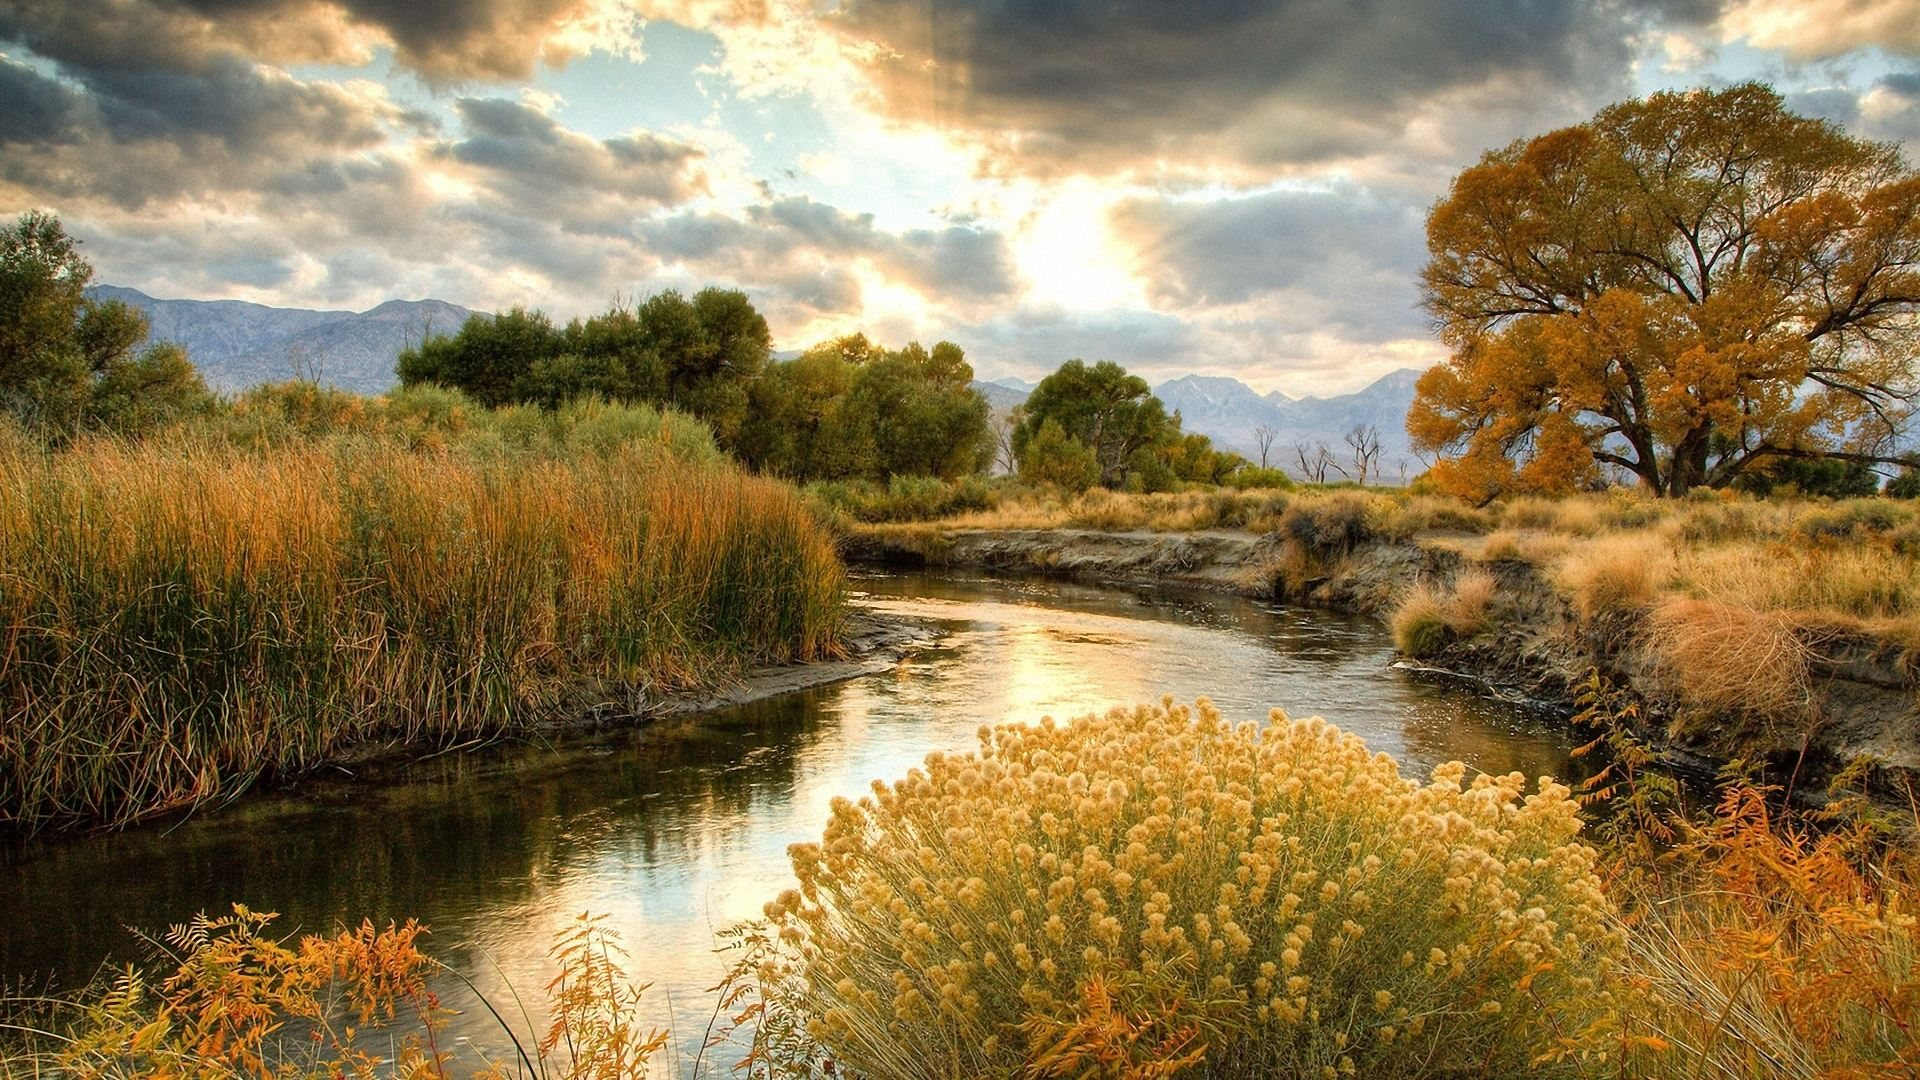 Autumn scenery full hd desktop wallpapers 1080p - Hd photos of scenery ...